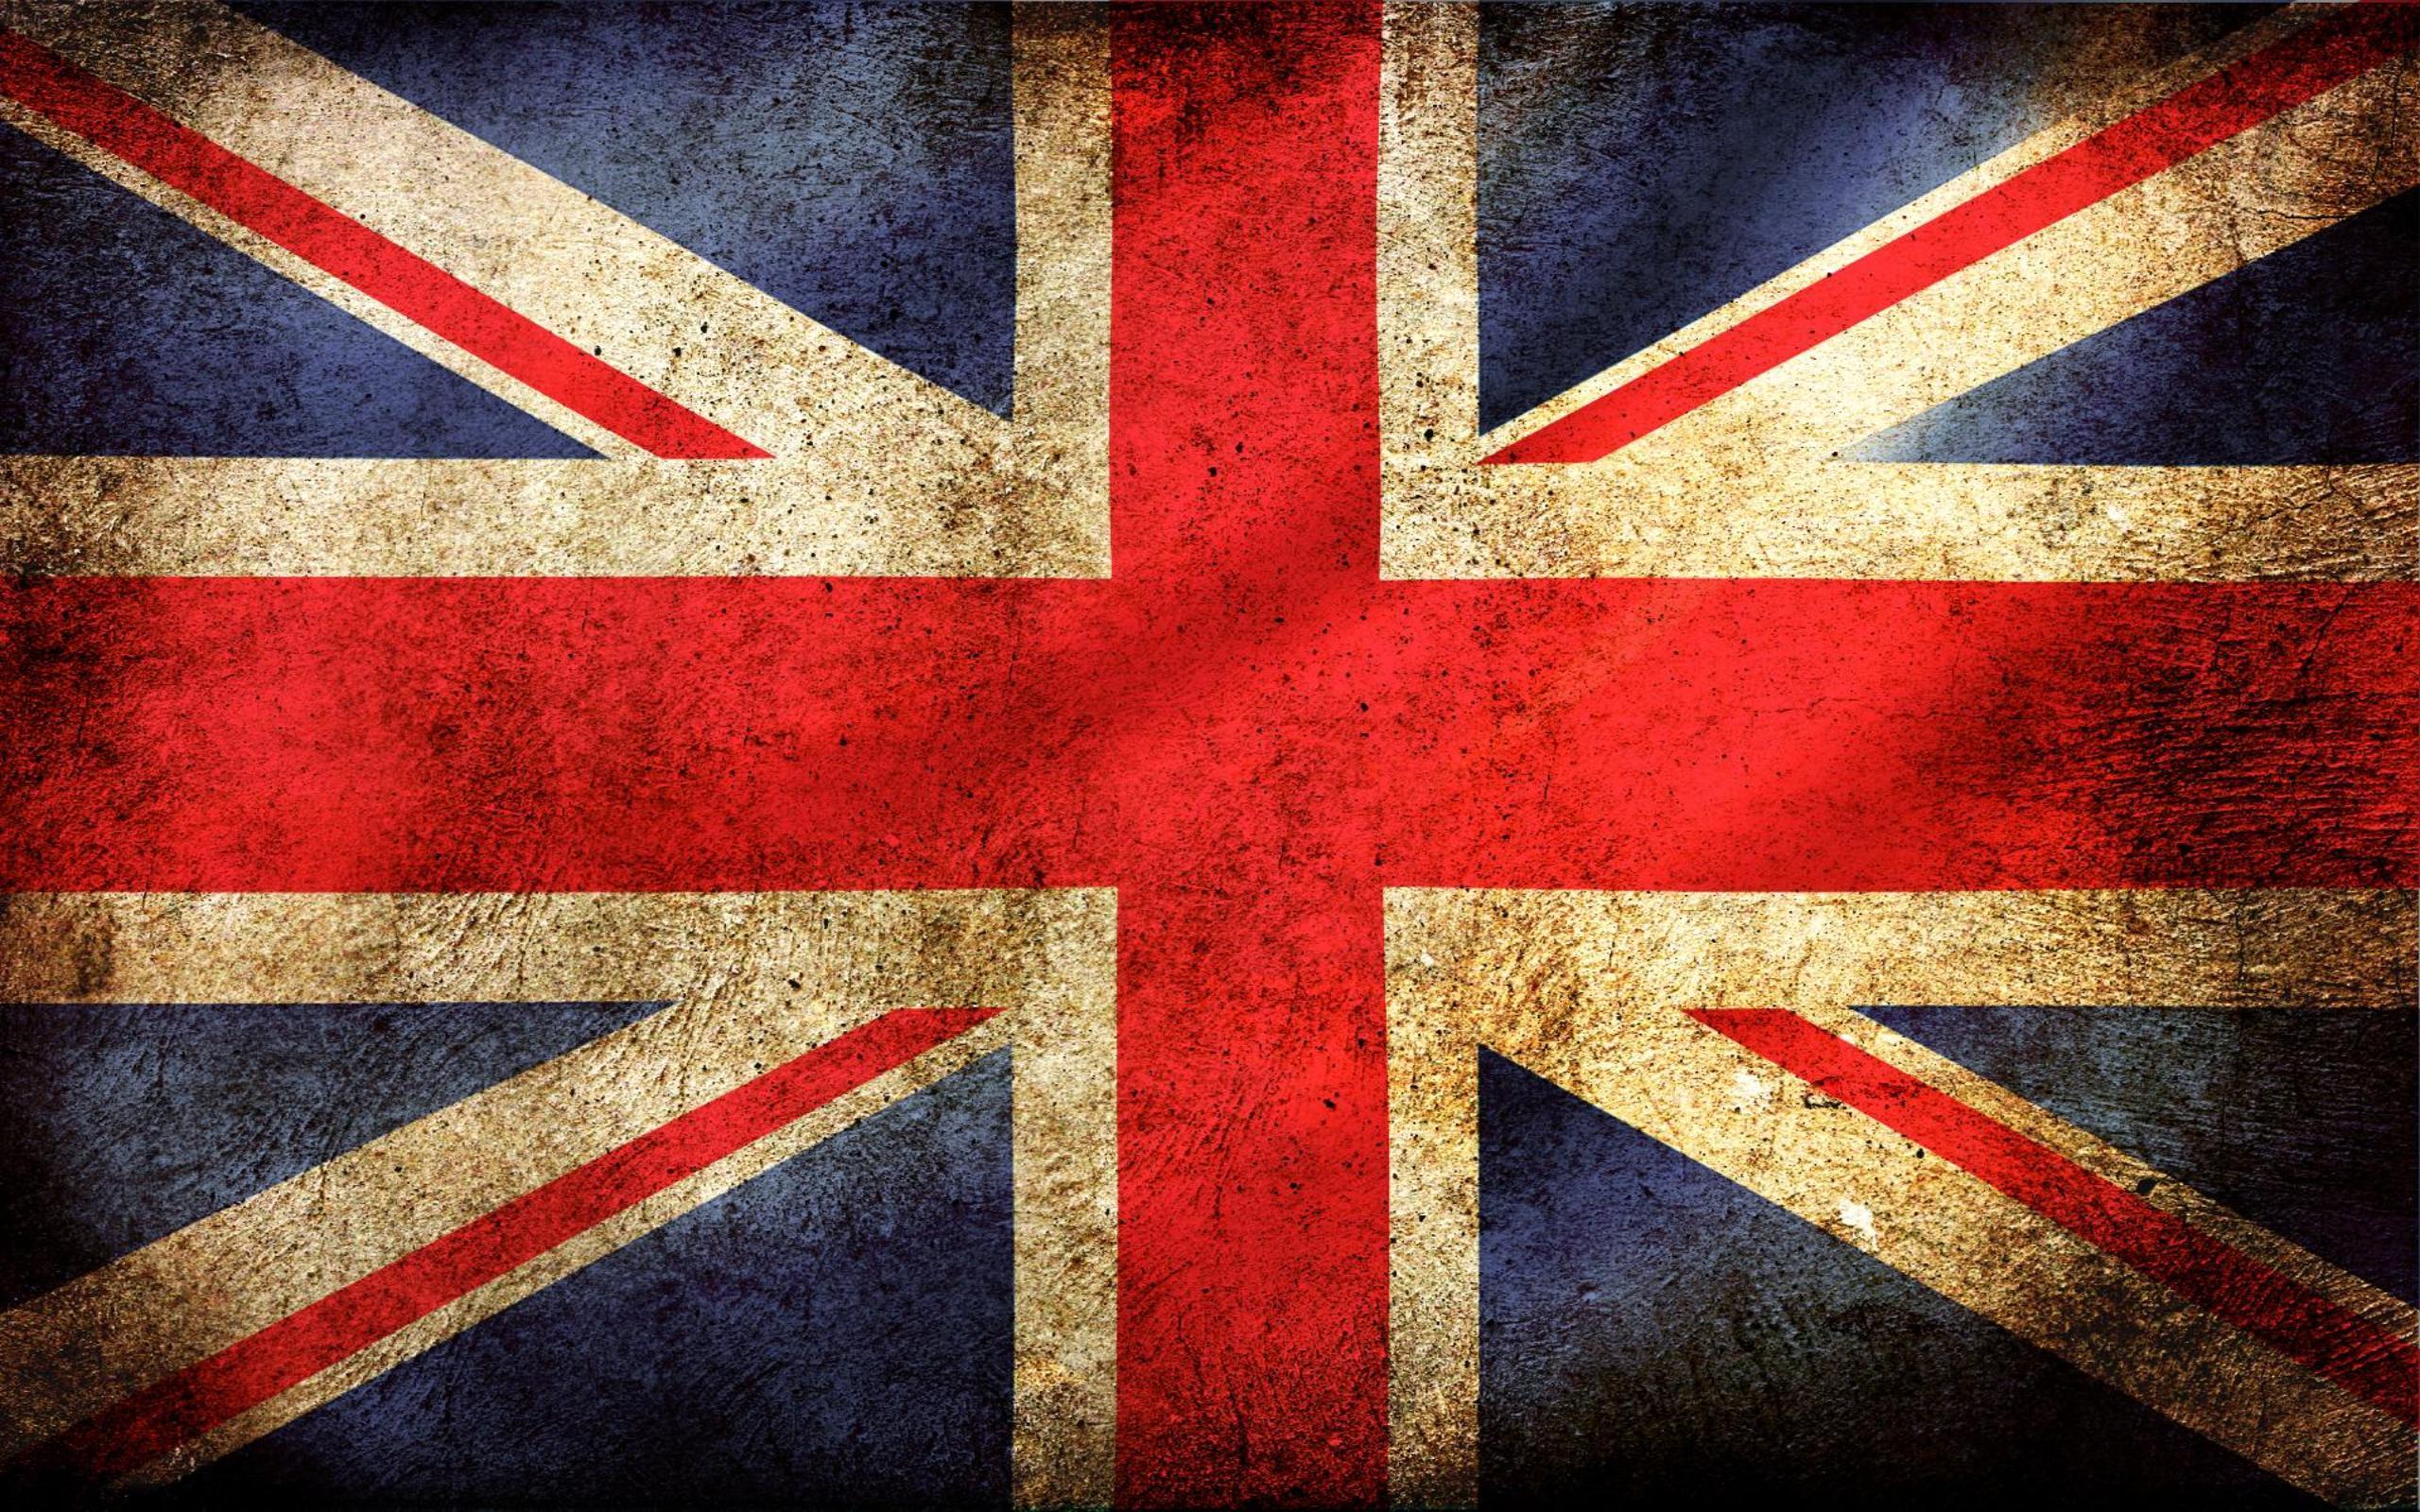 17356 Заставки и Обои Флаги на телефон. Скачать Флаги, Фон картинки бесплатно